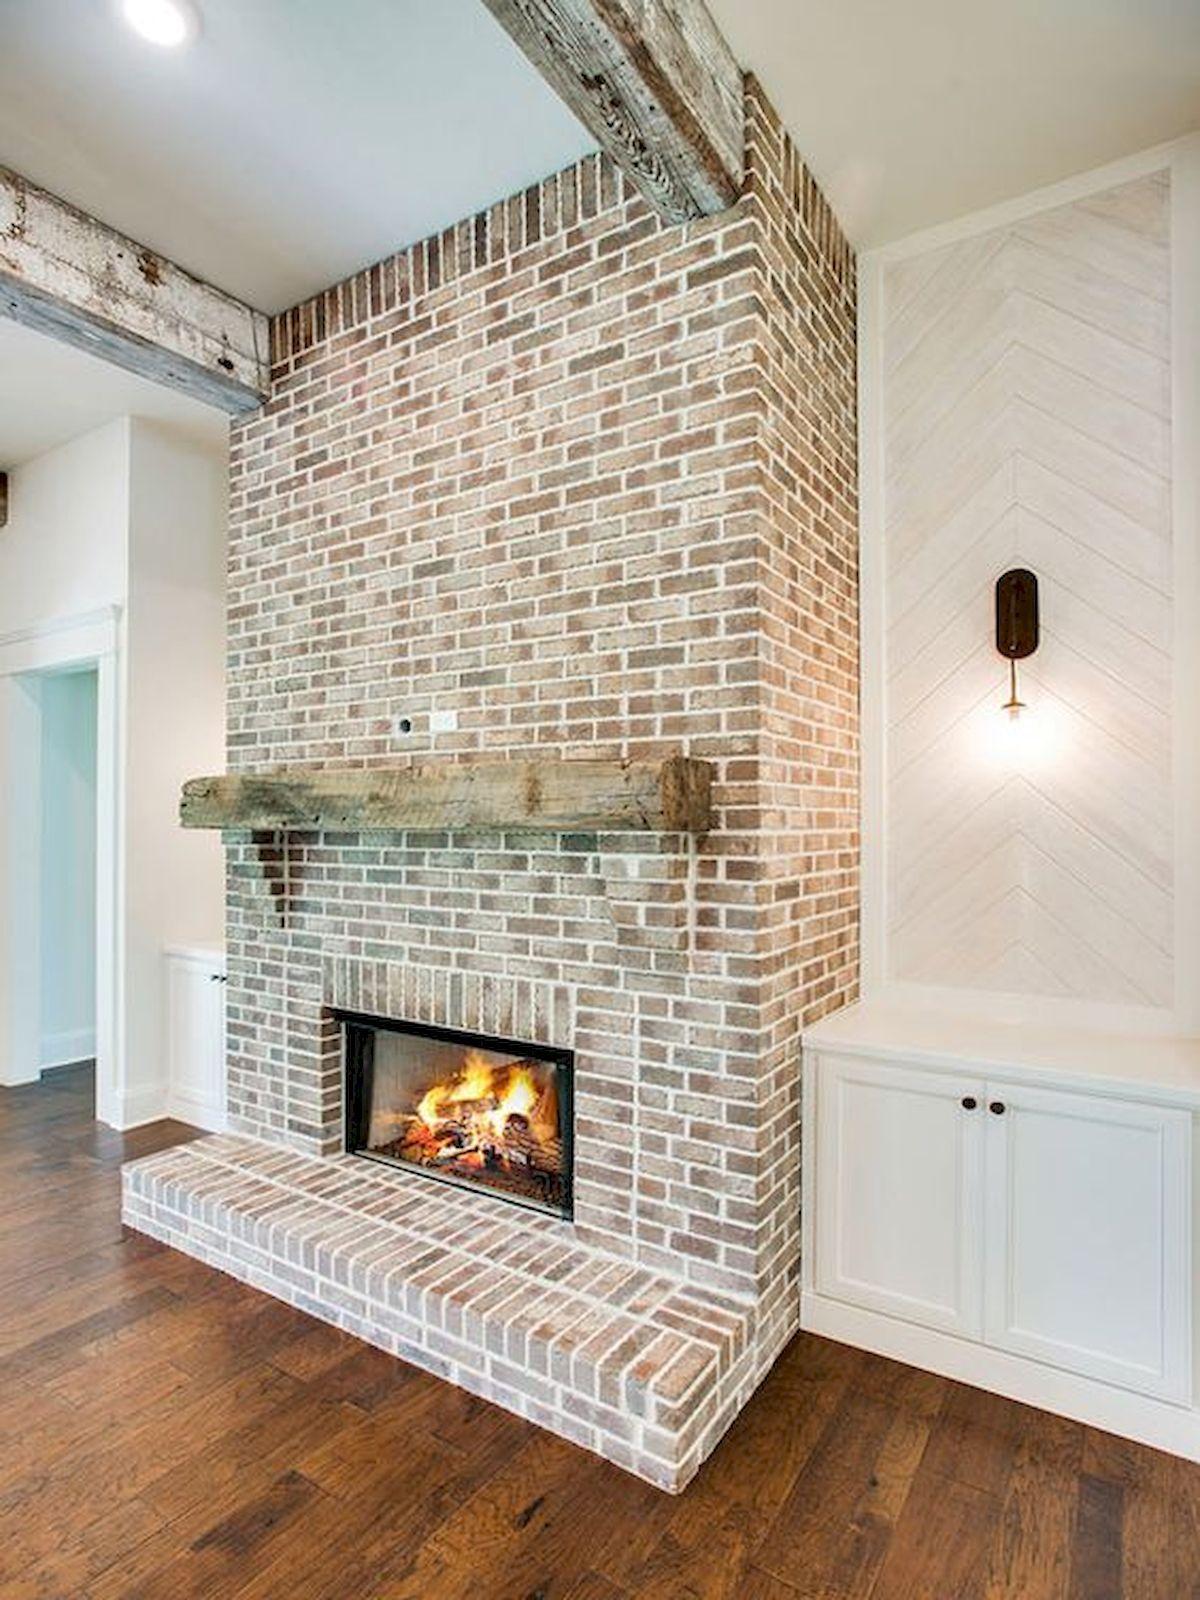 33 Farmhouse Fireplace Decor Ideas And